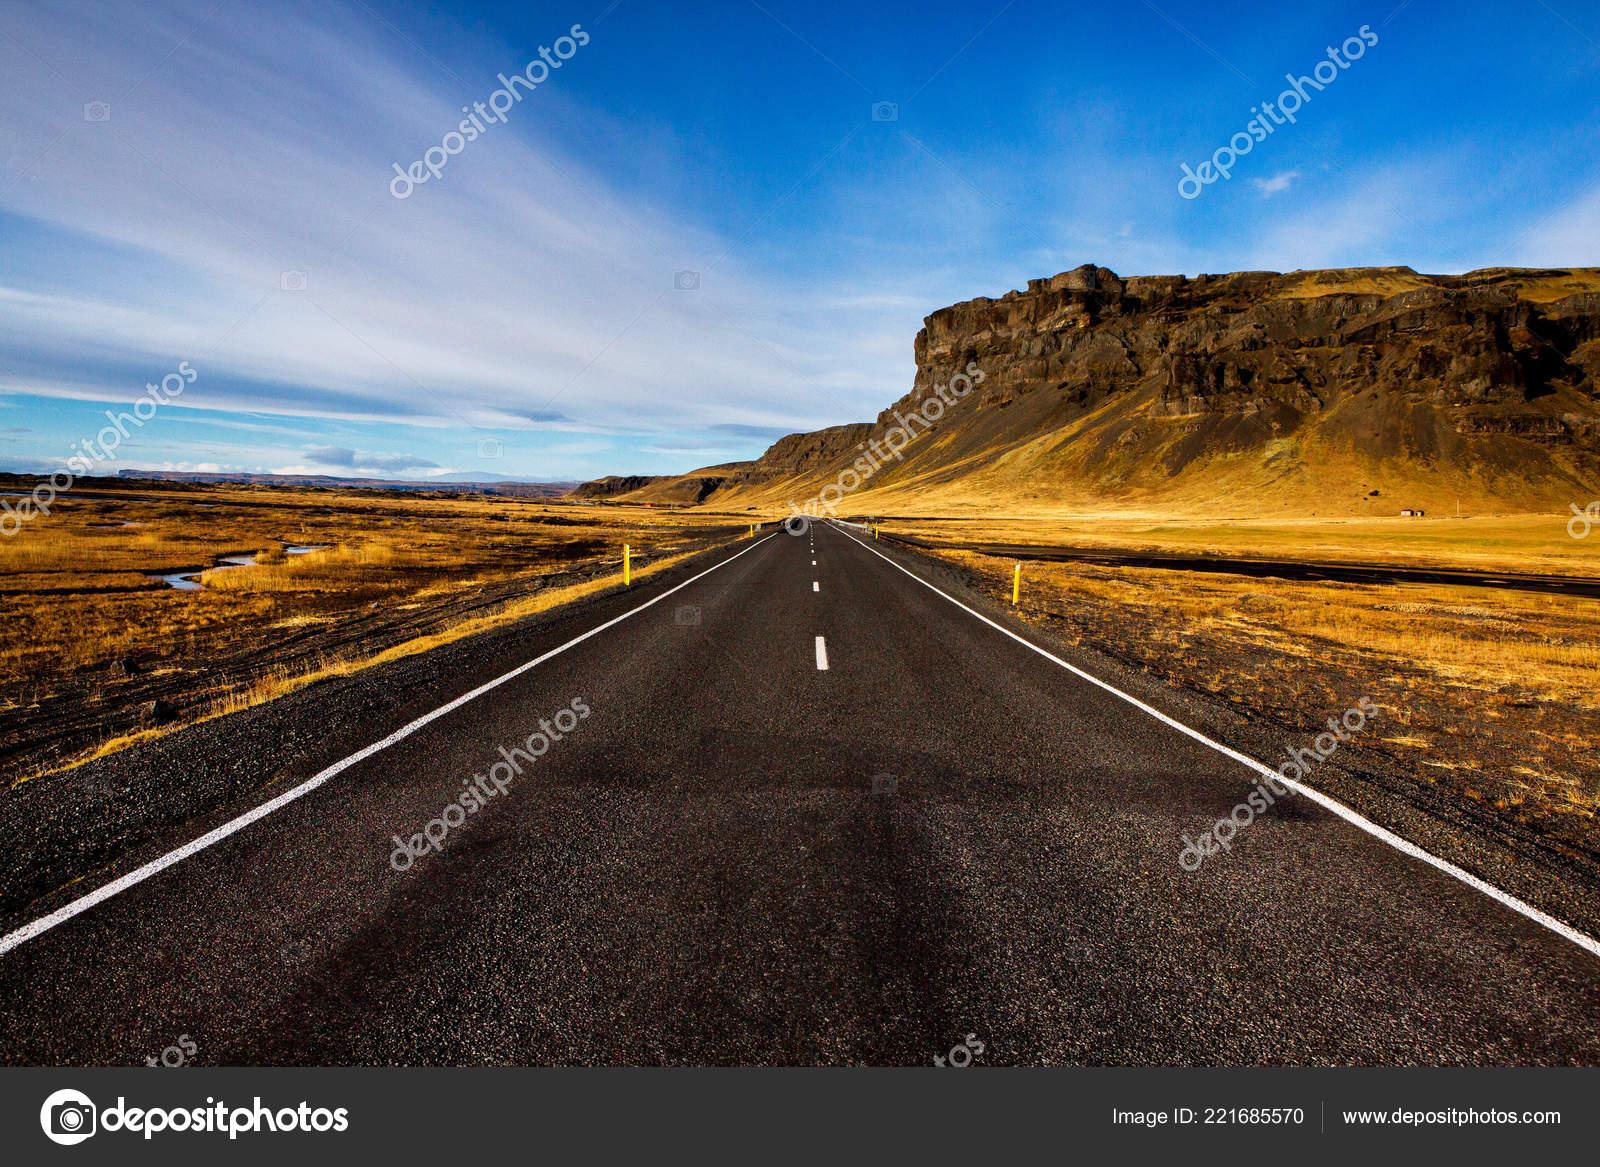 Estrada Atraves Paisagem Iceland Road Car Travel Scenic Sunset Road Stock Photo C Romeovip 221685570